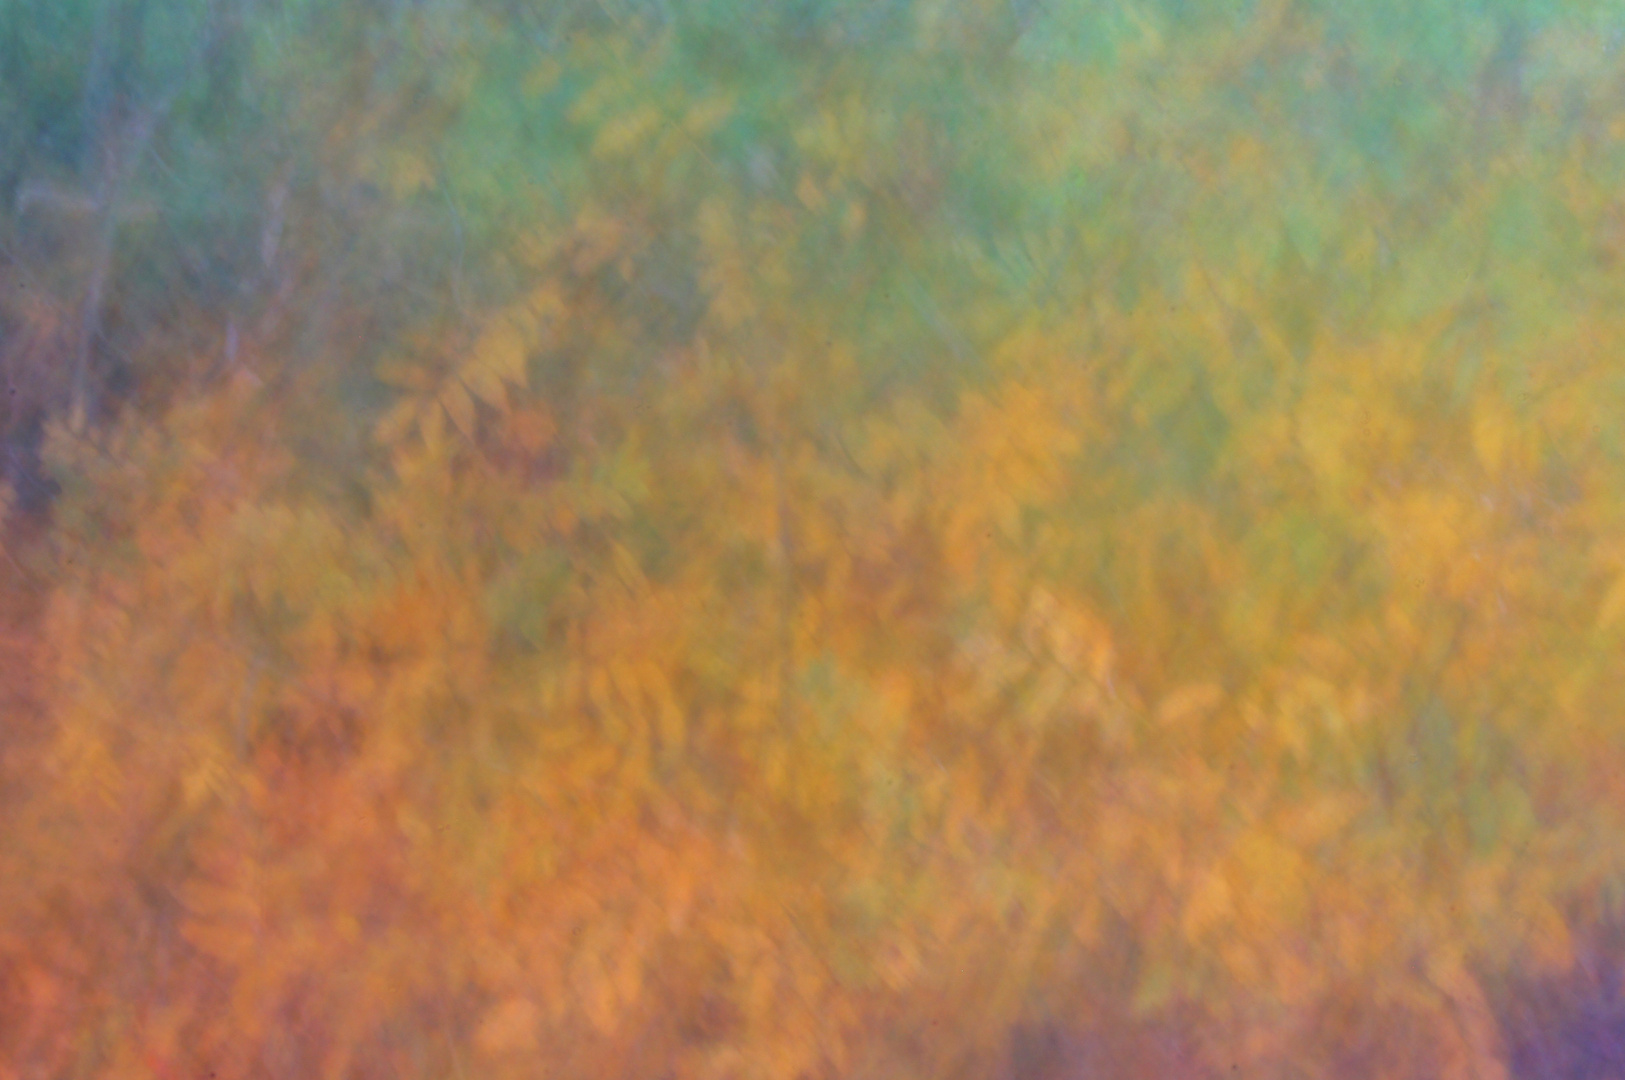 Herbst-Impressionen IX